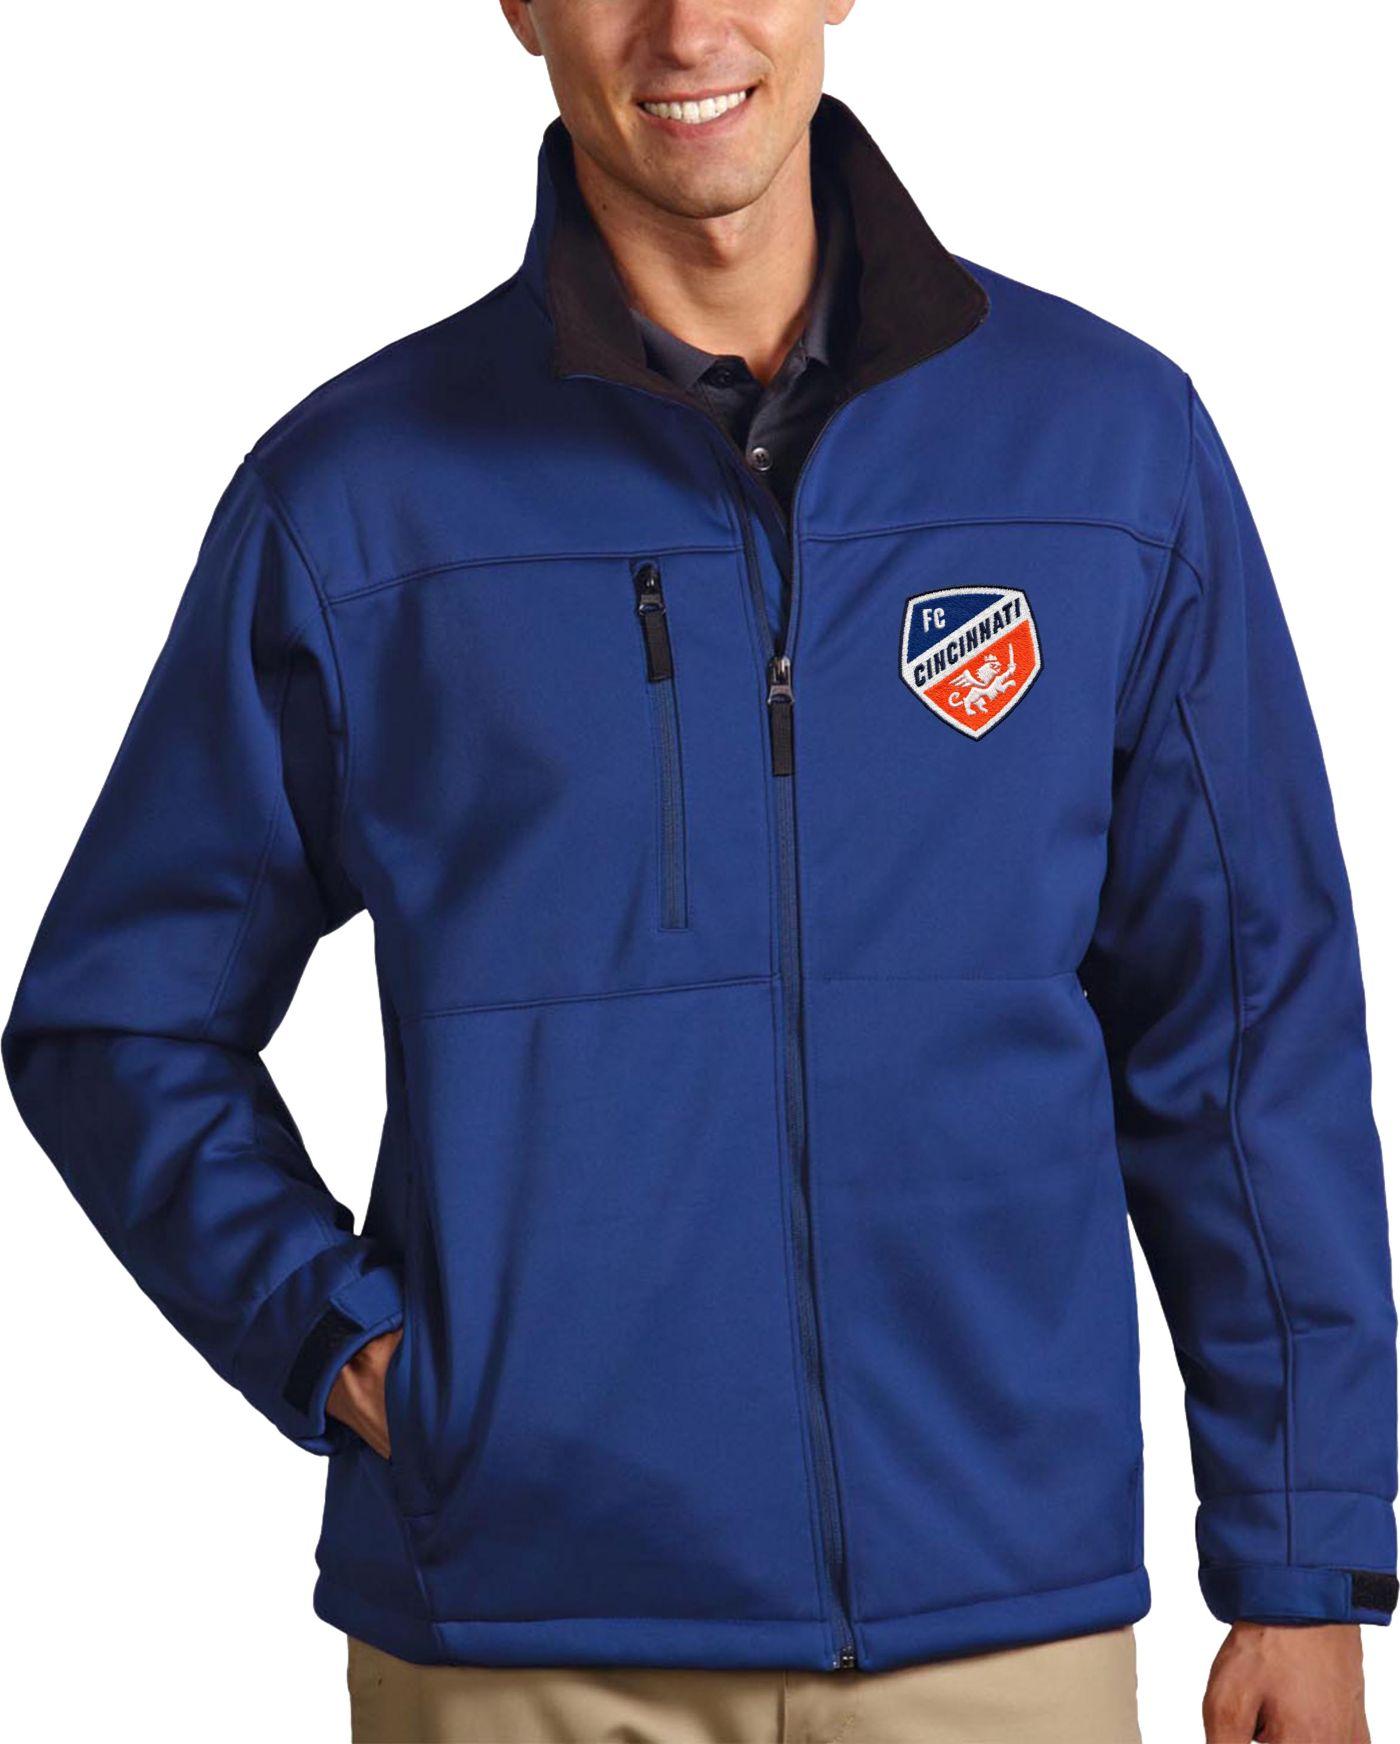 Antigua Men's FC Cincinnati Traverse Royal Full-Zip Jacket